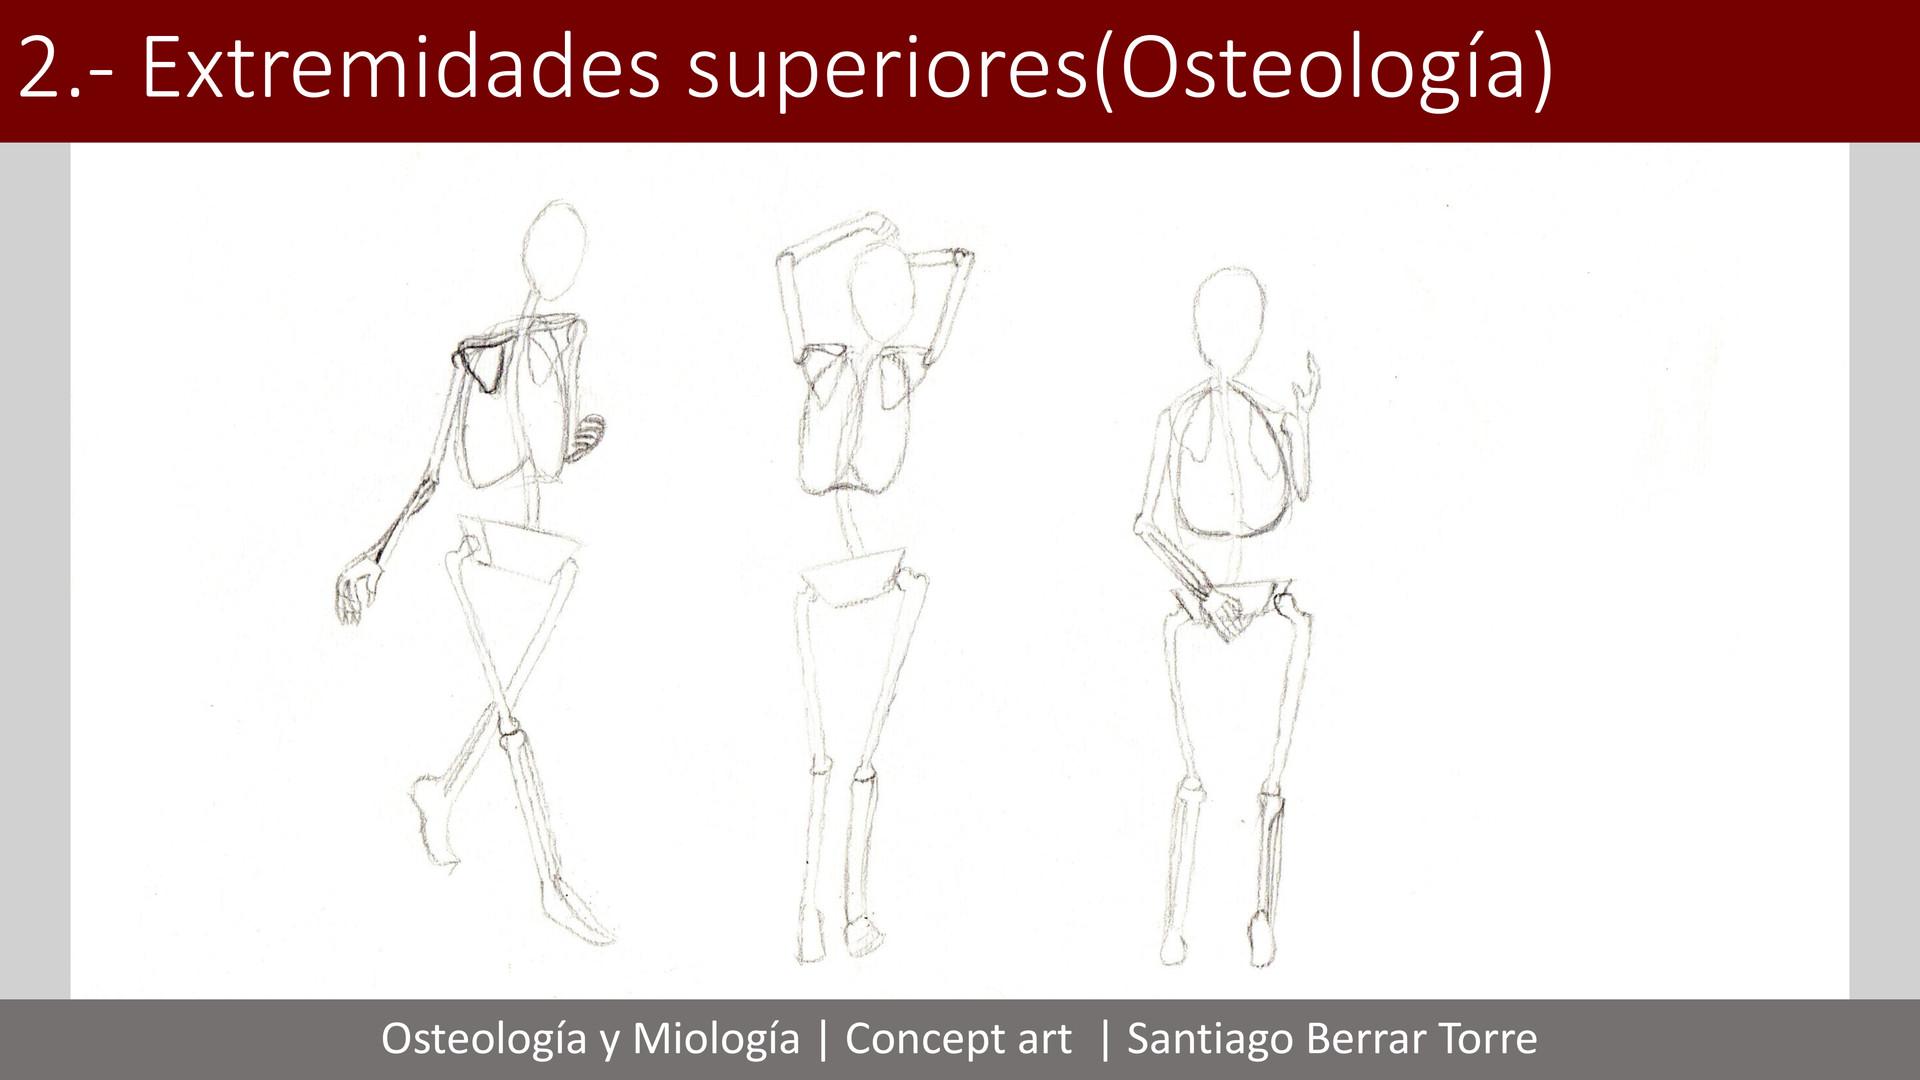 Asombroso Anatomía Notas De Las Extremidades Superiores Bosquejo ...